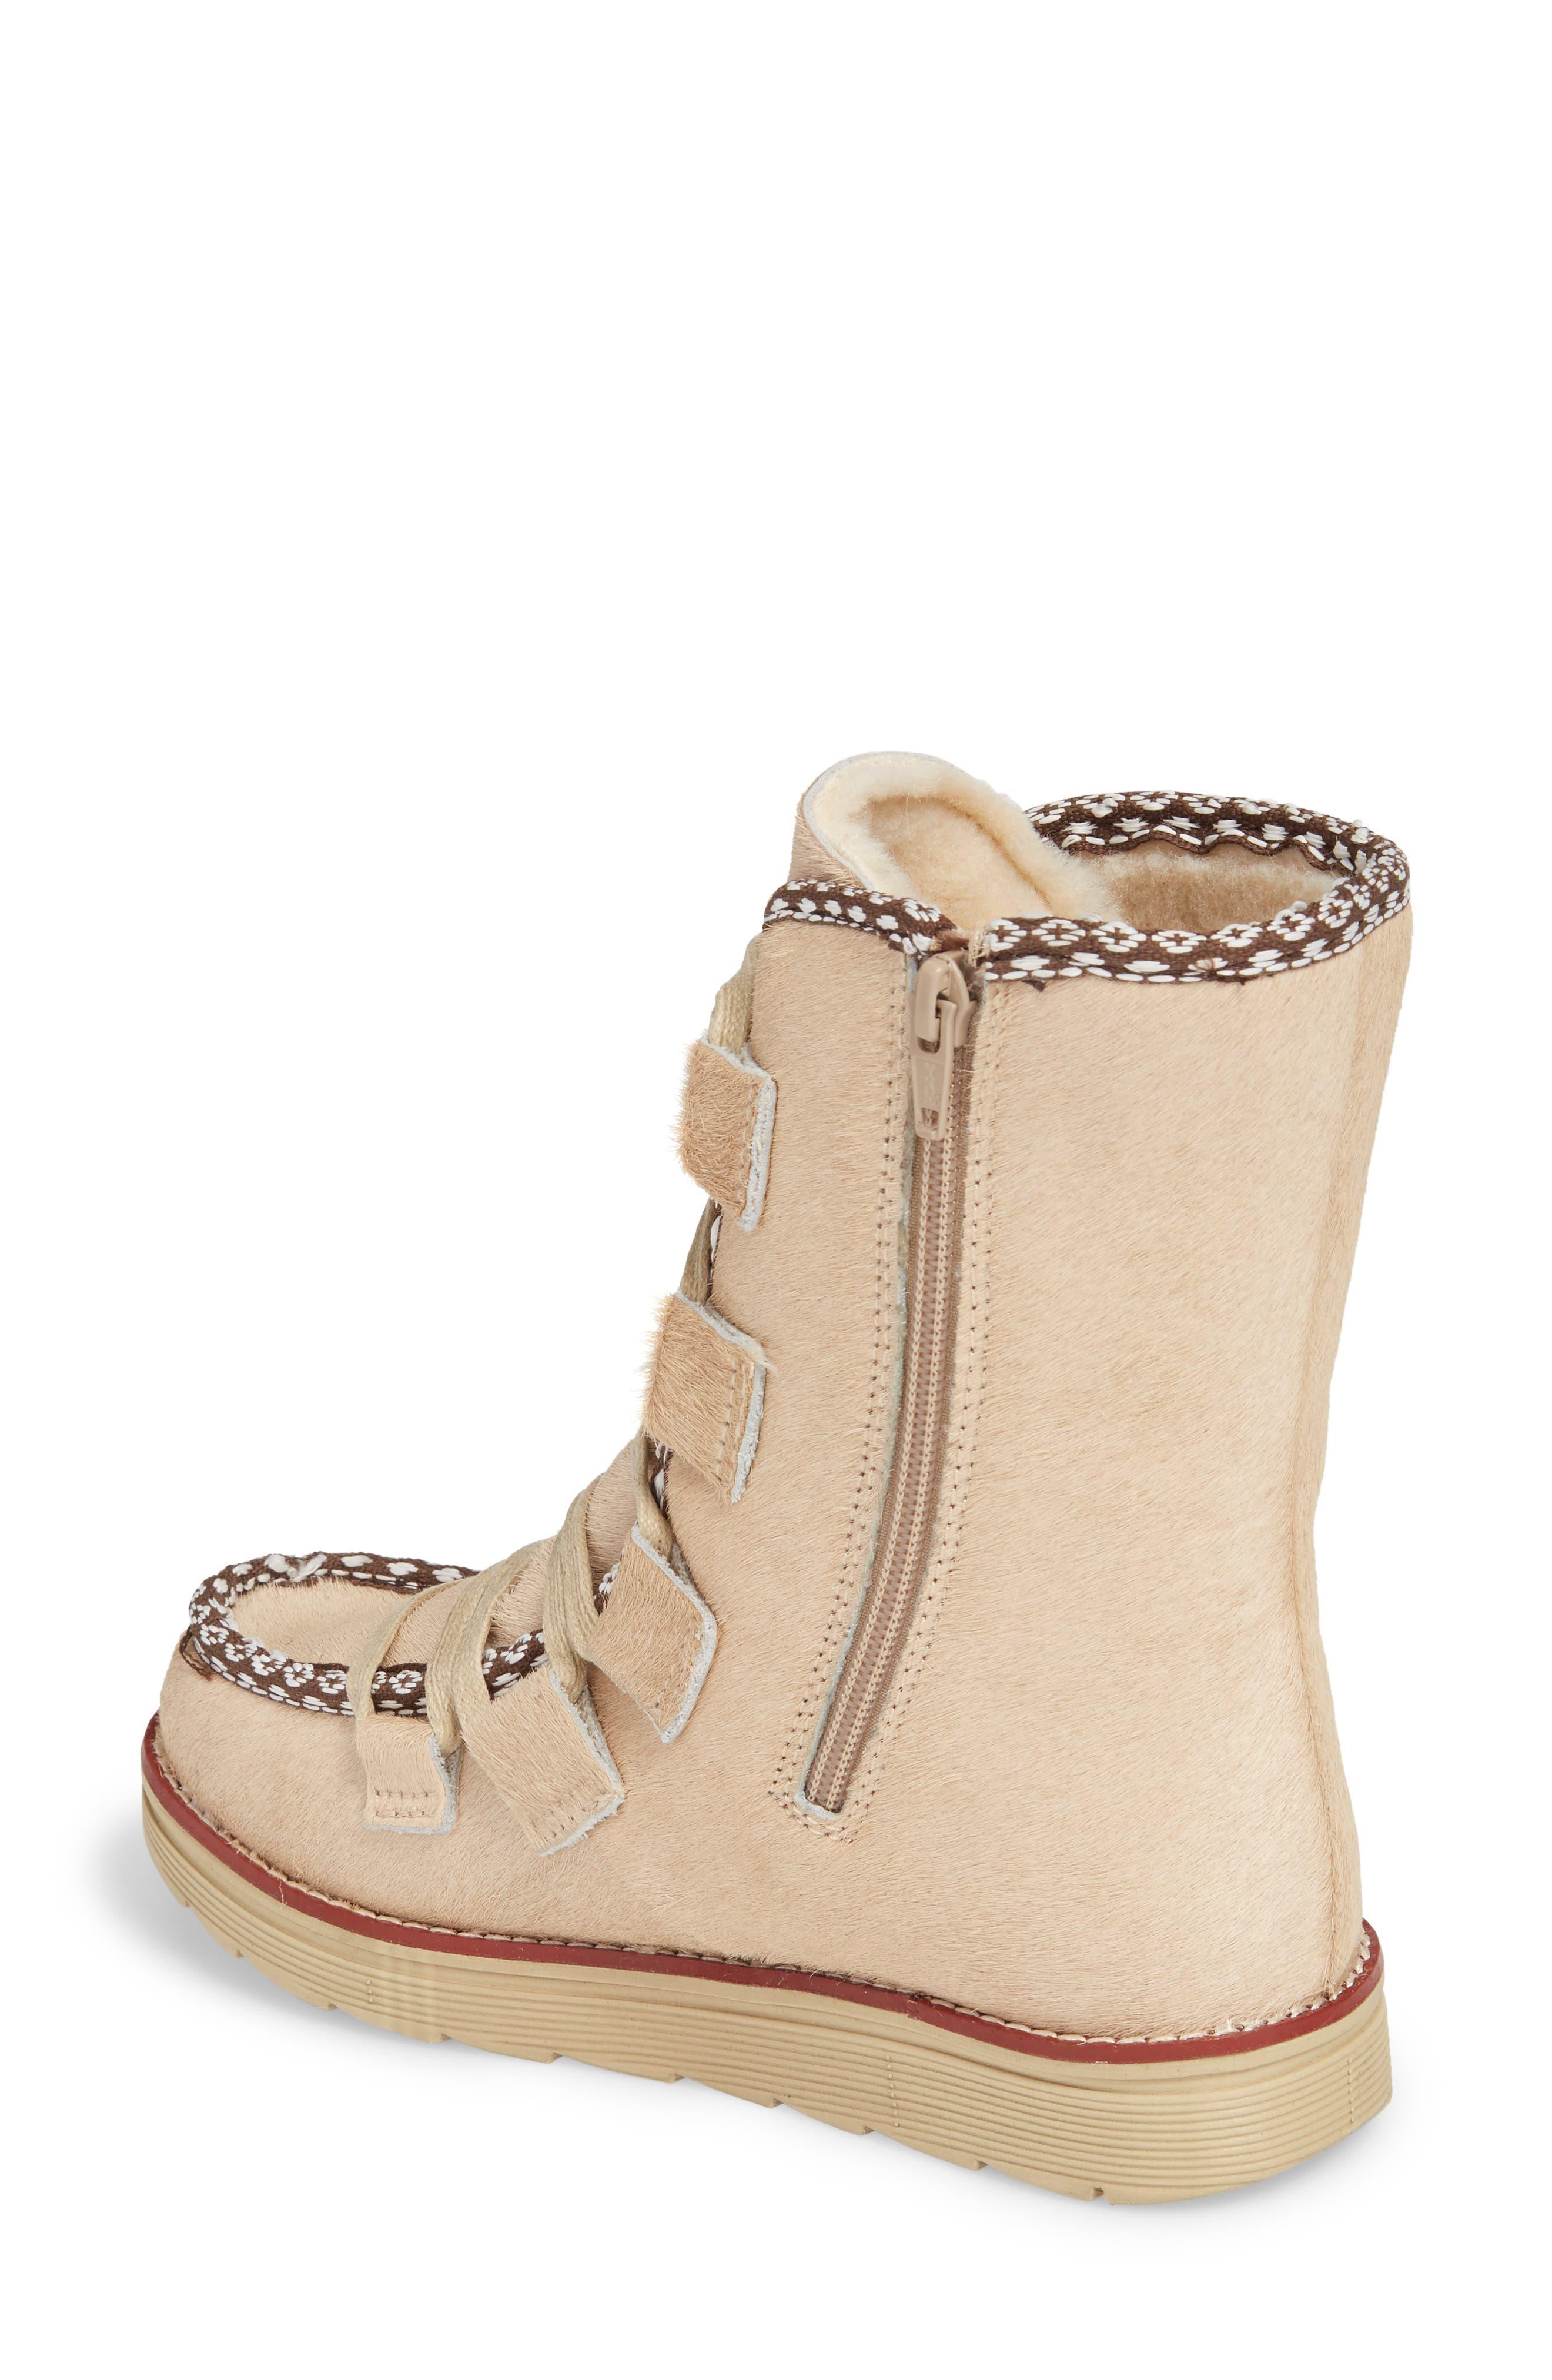 Alternate Image 2  - Royal Canadian Kitchener Waterproof Genuine Calf Hair Snow Boot (Women)